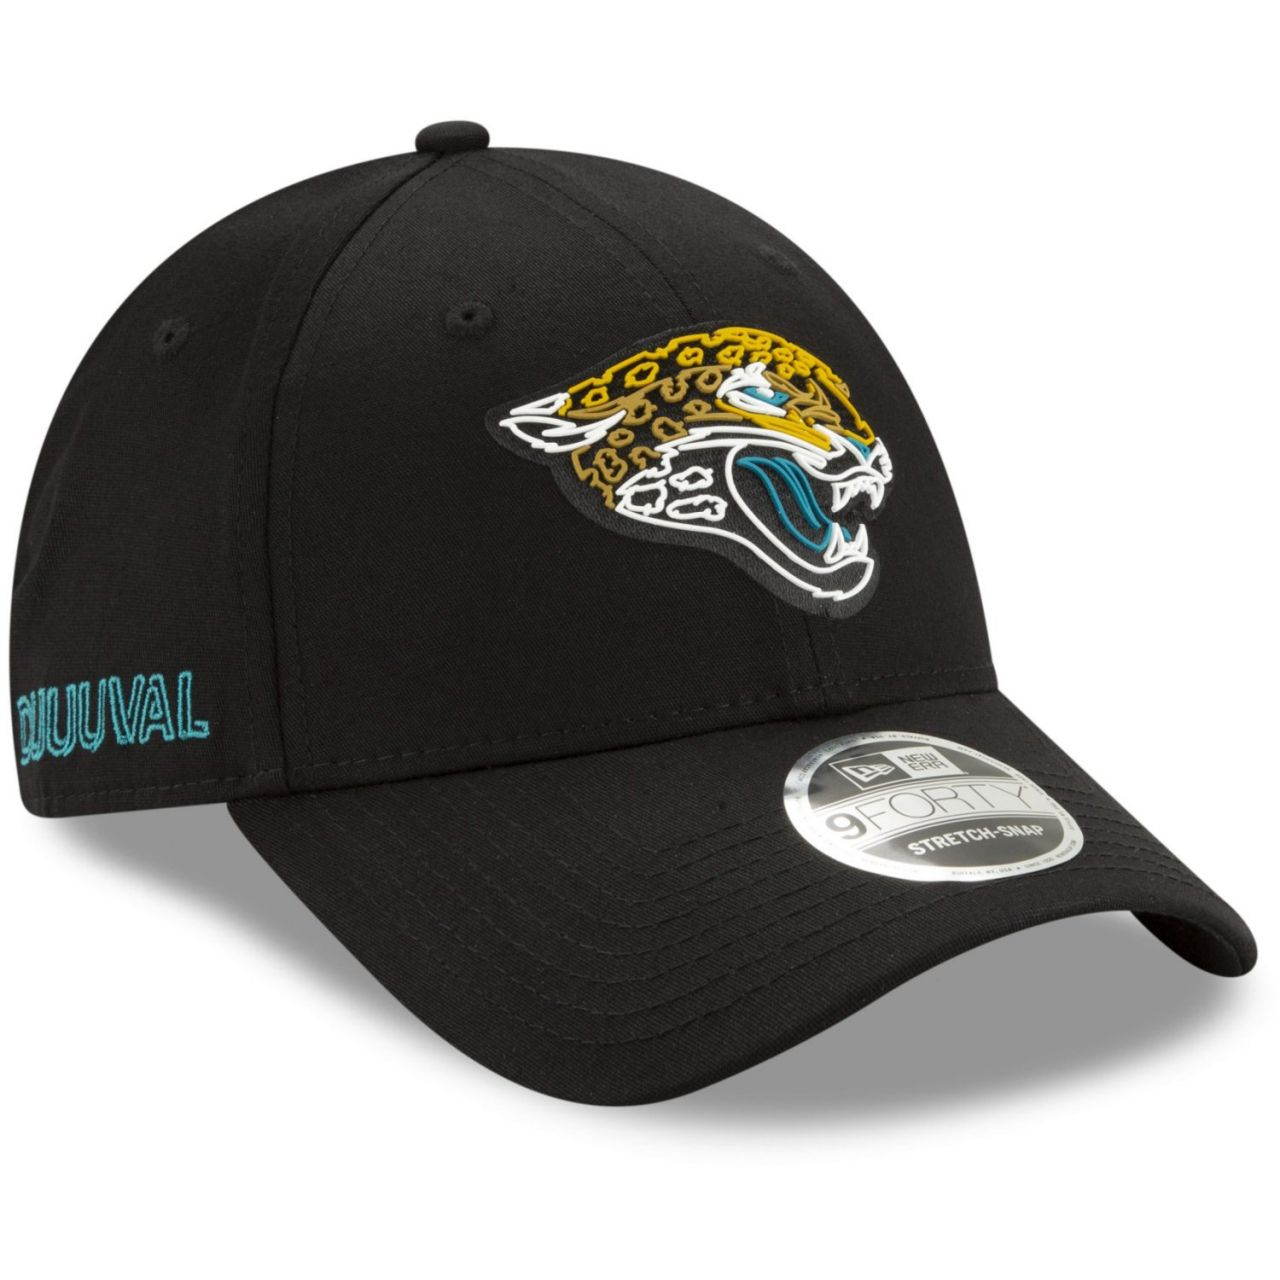 amfoo - New Era 9FORTY Stretch Cap - 2020 DRAFT Jacksonville Jaguars